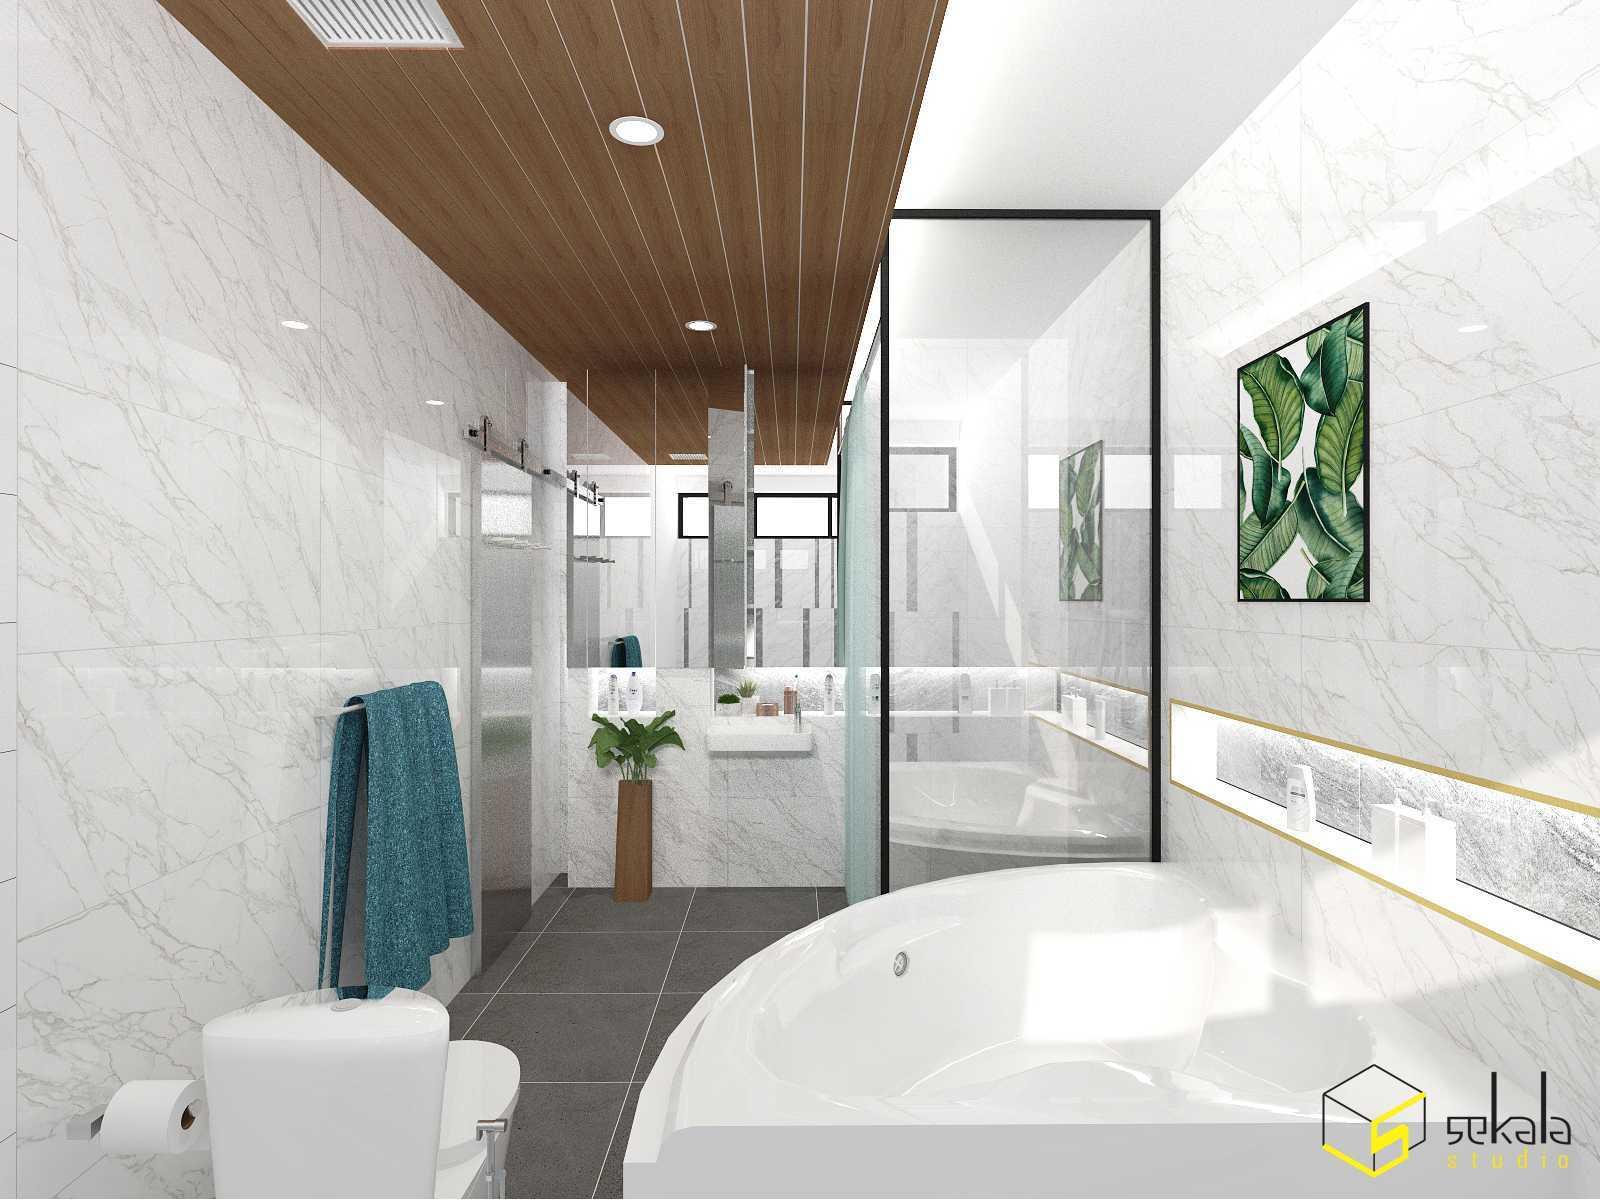 Sekala Mr. Adrian's Bathroom Banyuasin I, Kabupaten Banyu Asin, Sumatera Selatan, Indonesia Banyuasin I, Kabupaten Banyu Asin, Sumatera Selatan, Indonesia Sekala-Mr-Adrians-Bathroom  55253